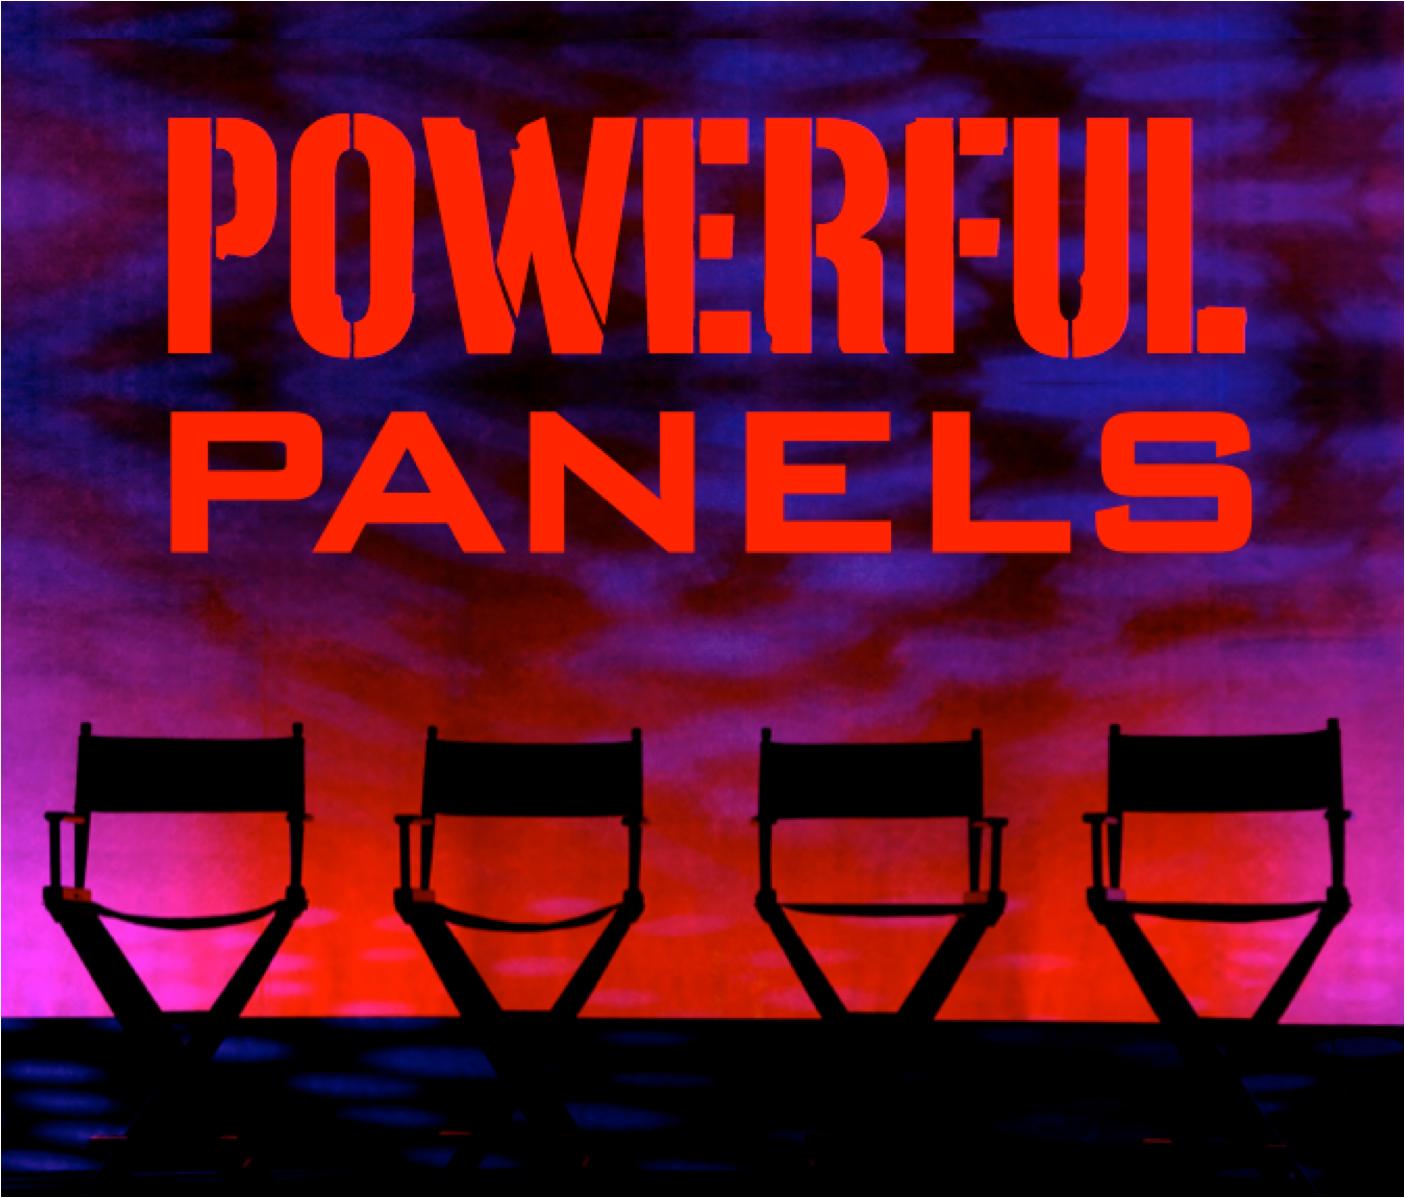 PowerfulPanels